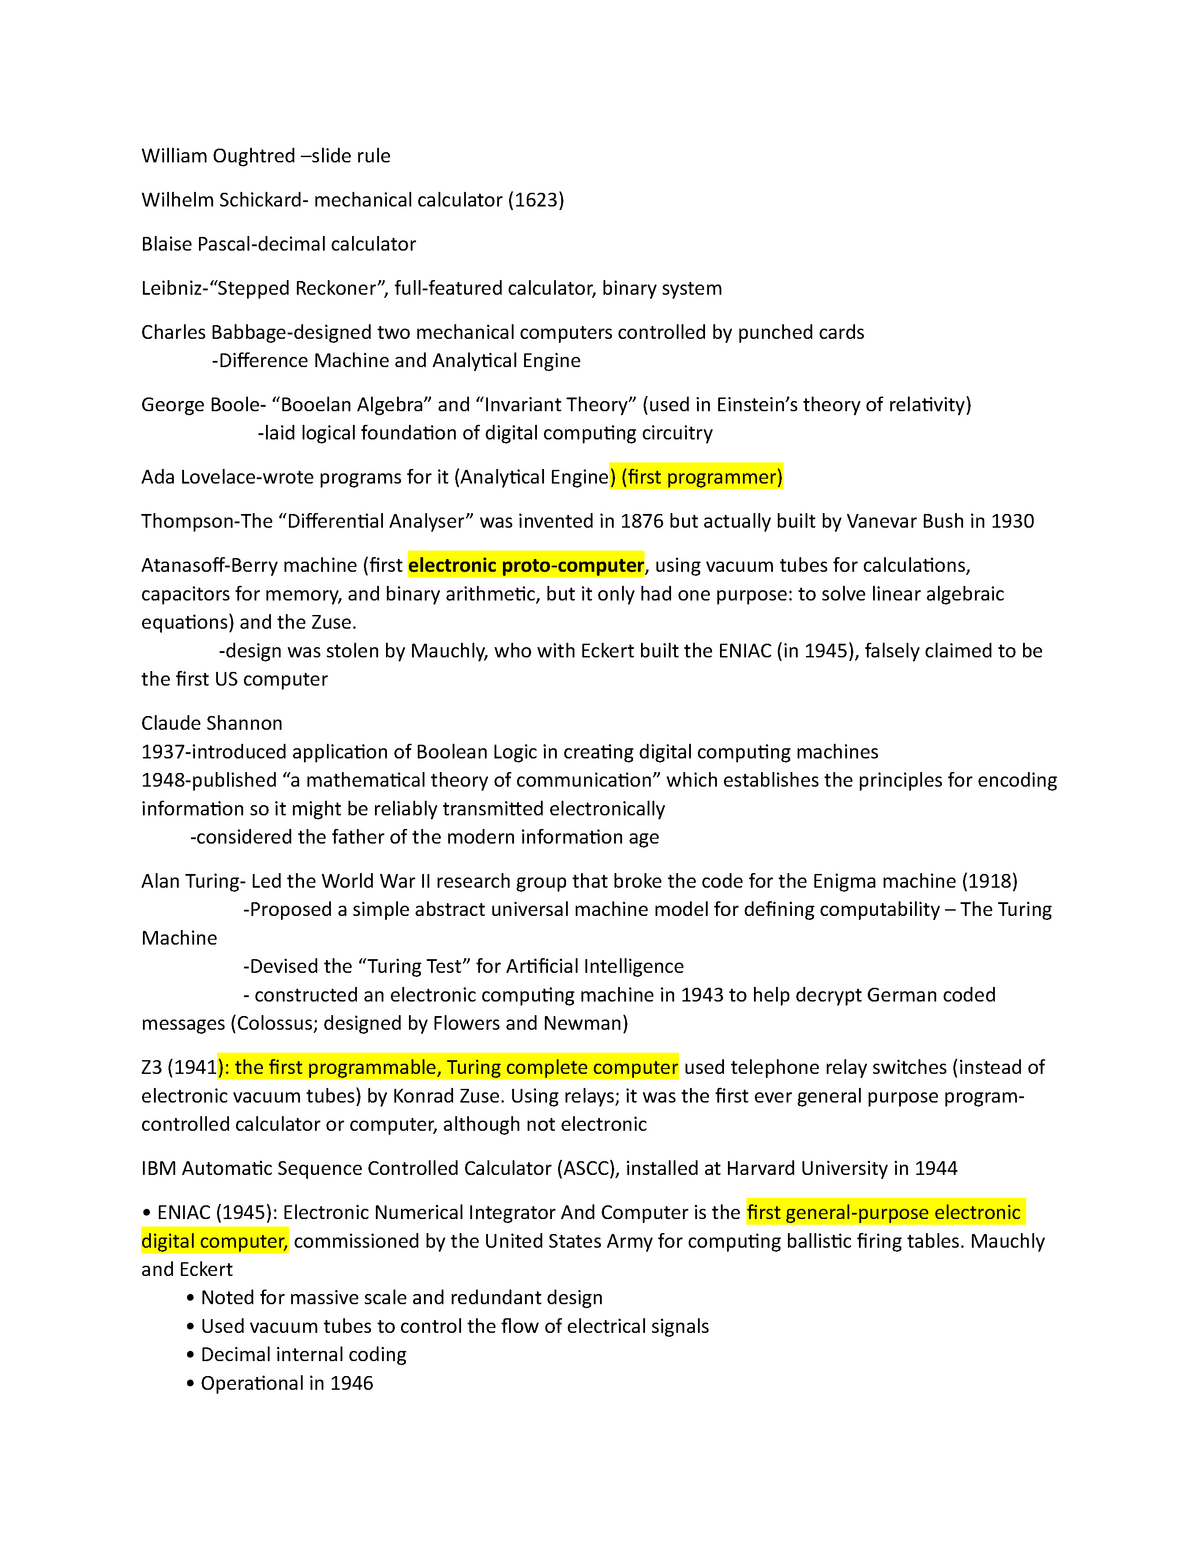 Notes for midterm 1 - EECS1520: Computer science - StuDocu